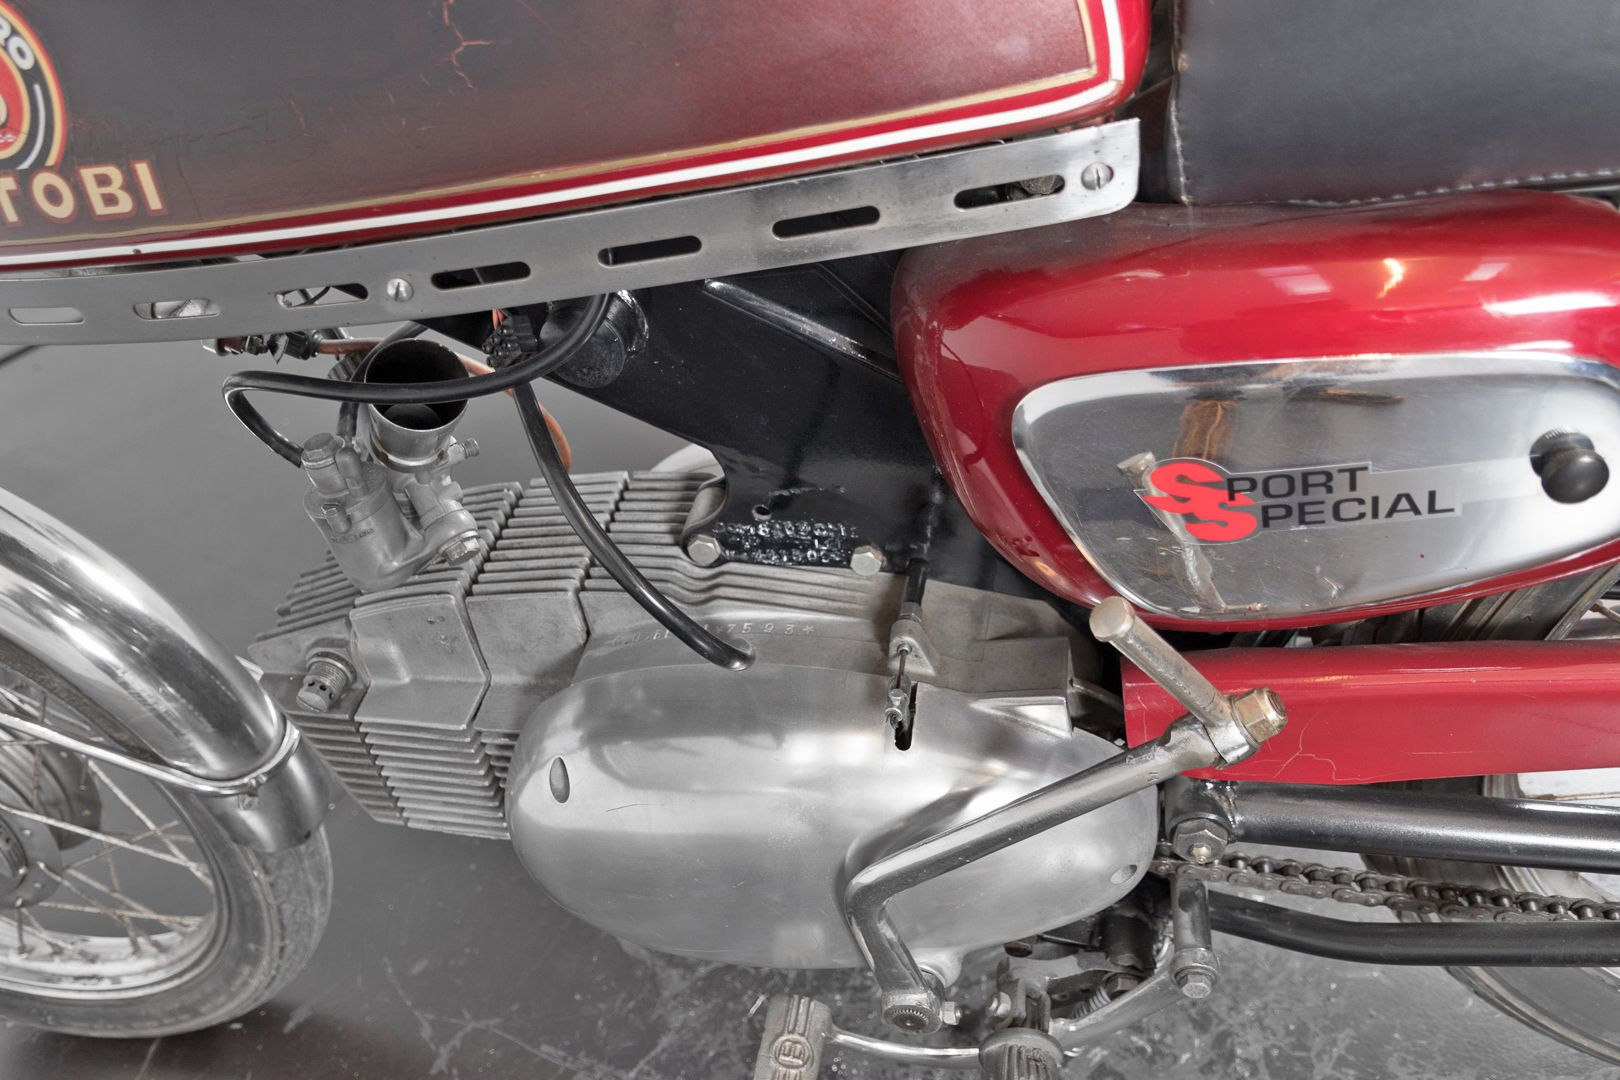 1968 MotoBi Sport Special  75044